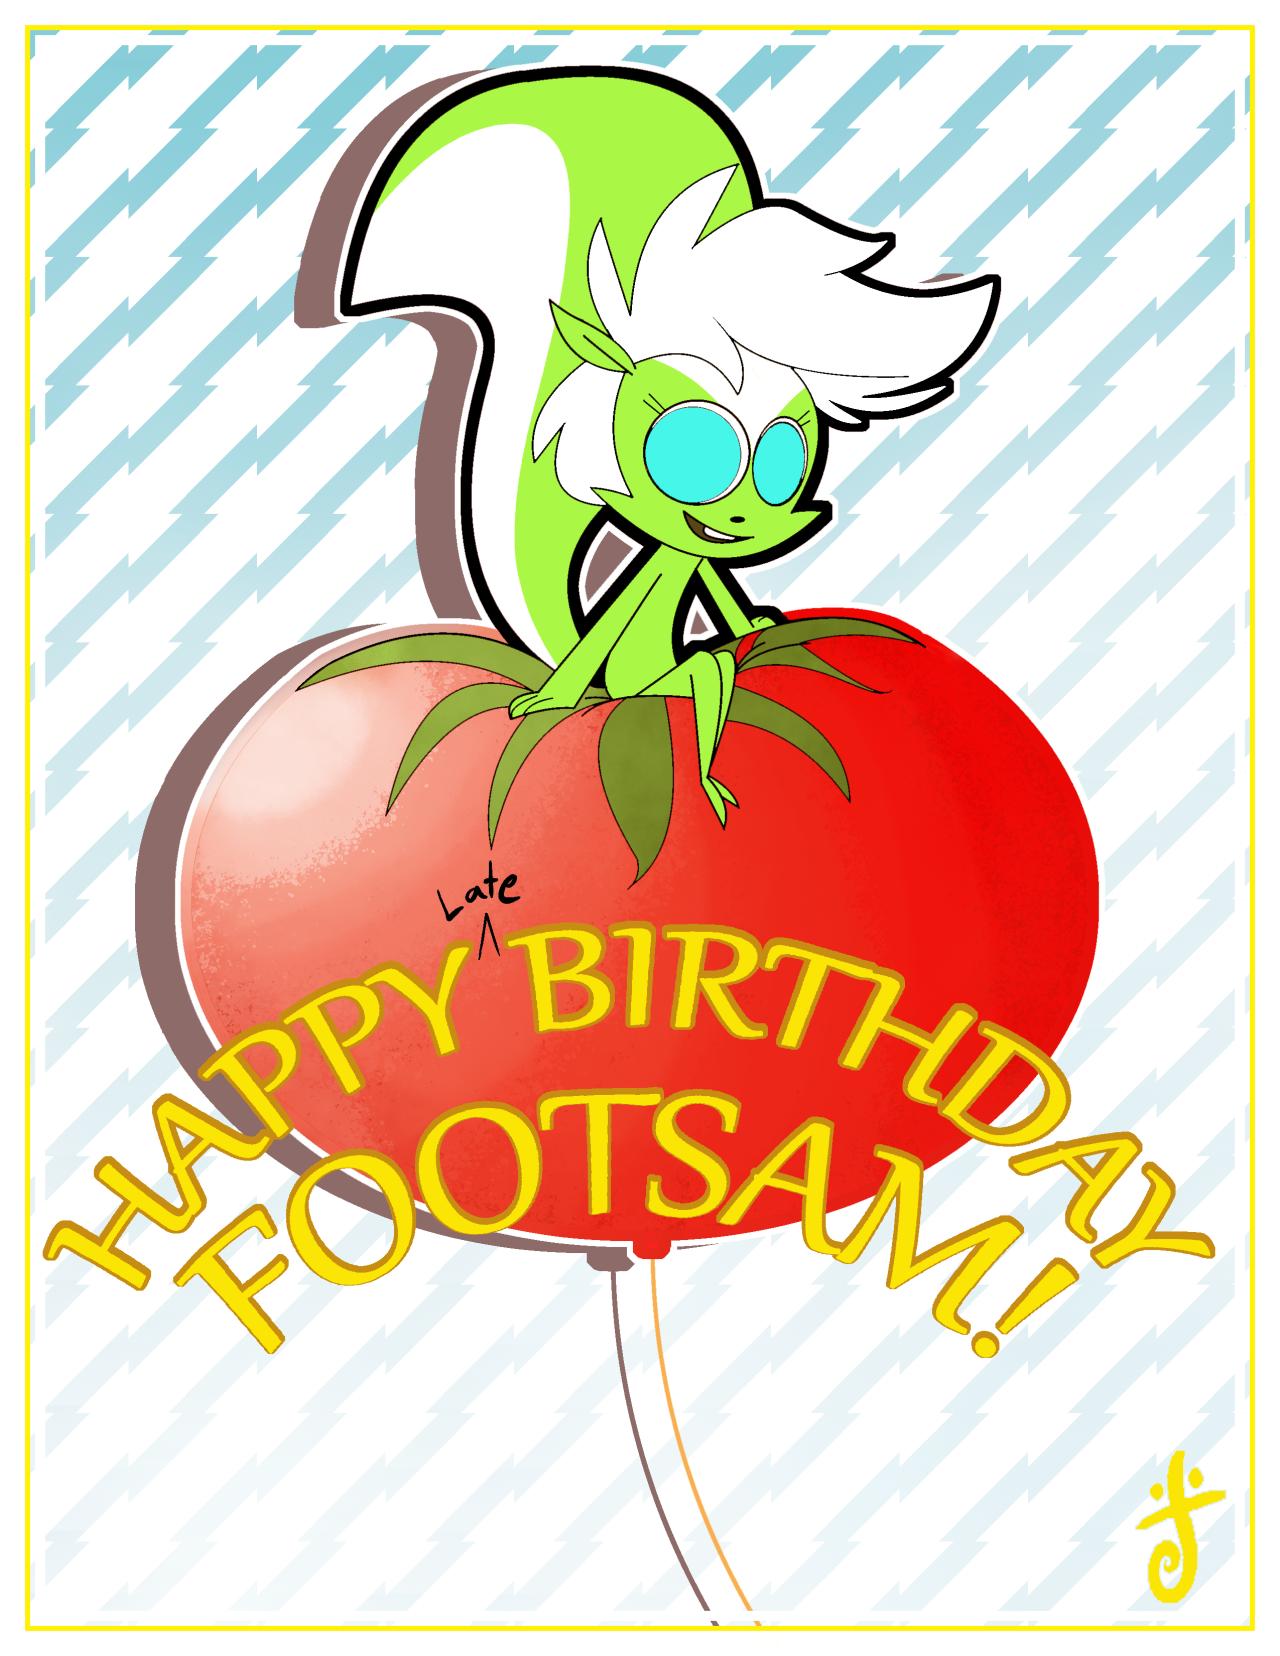 Birthday Fanart for Footsam!